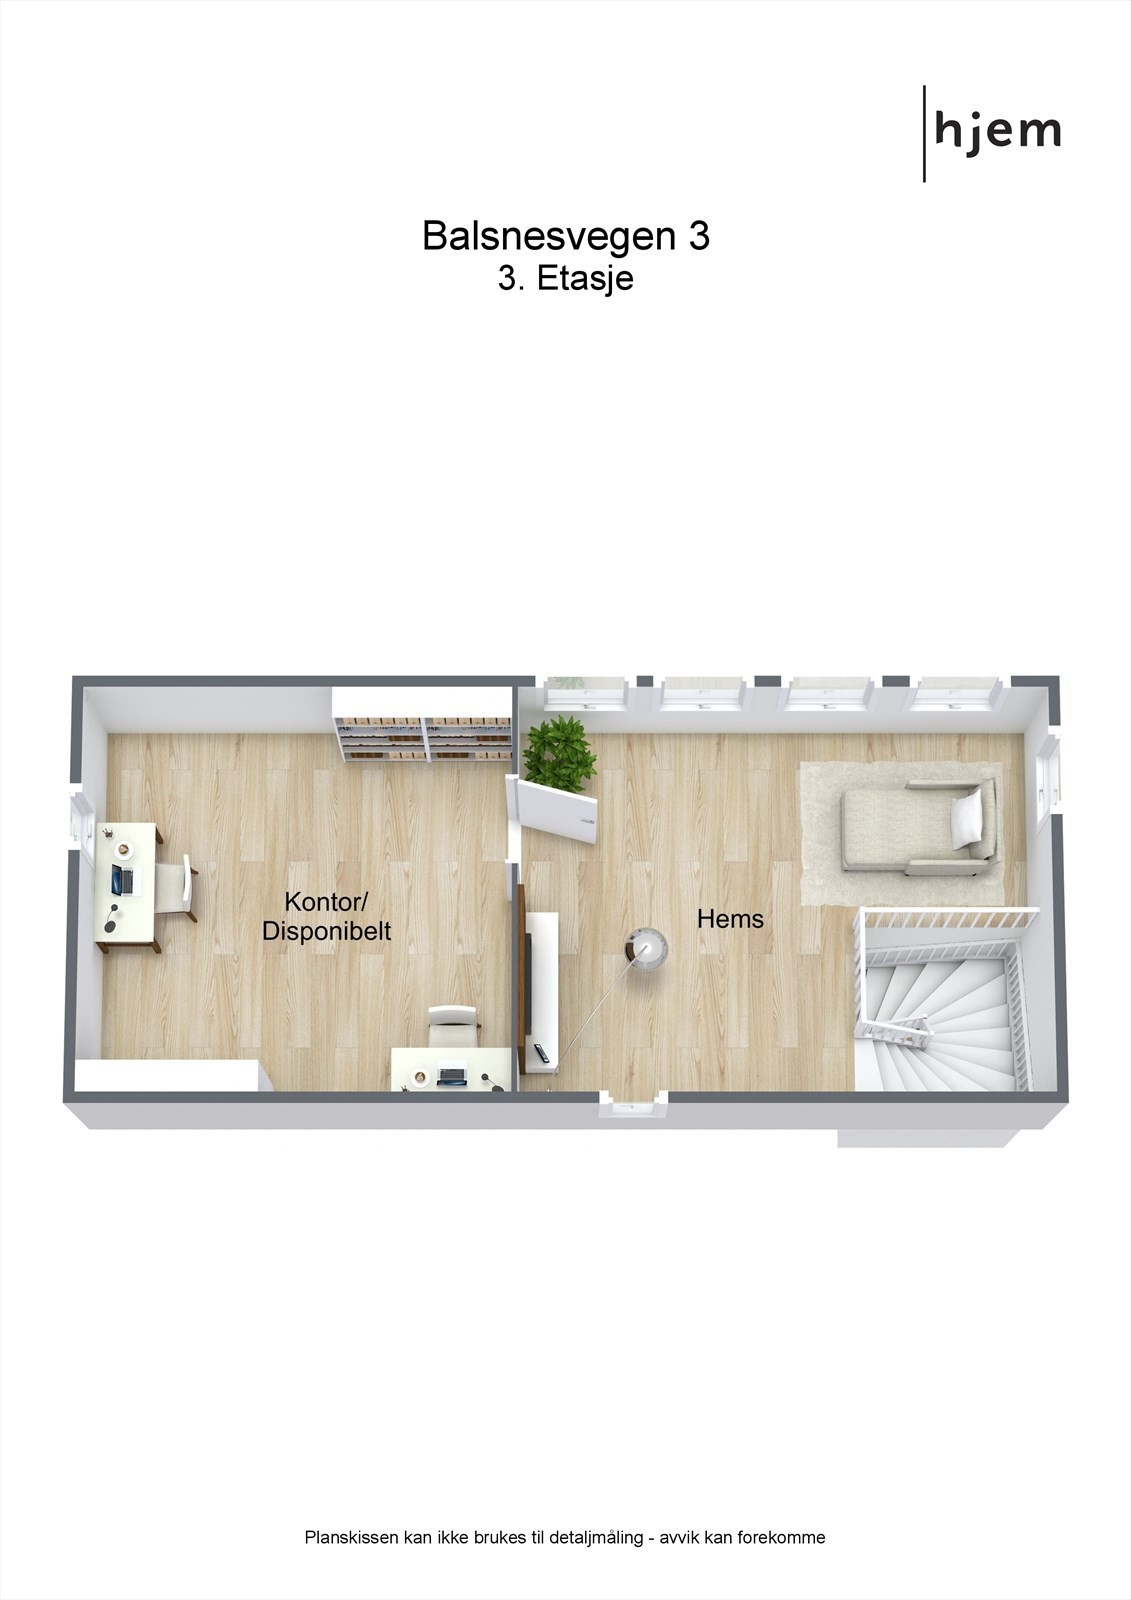 Floorplan letterhead - Balsnesvegen 3 - 3. Etasje - 3D Floor Plan.jpg